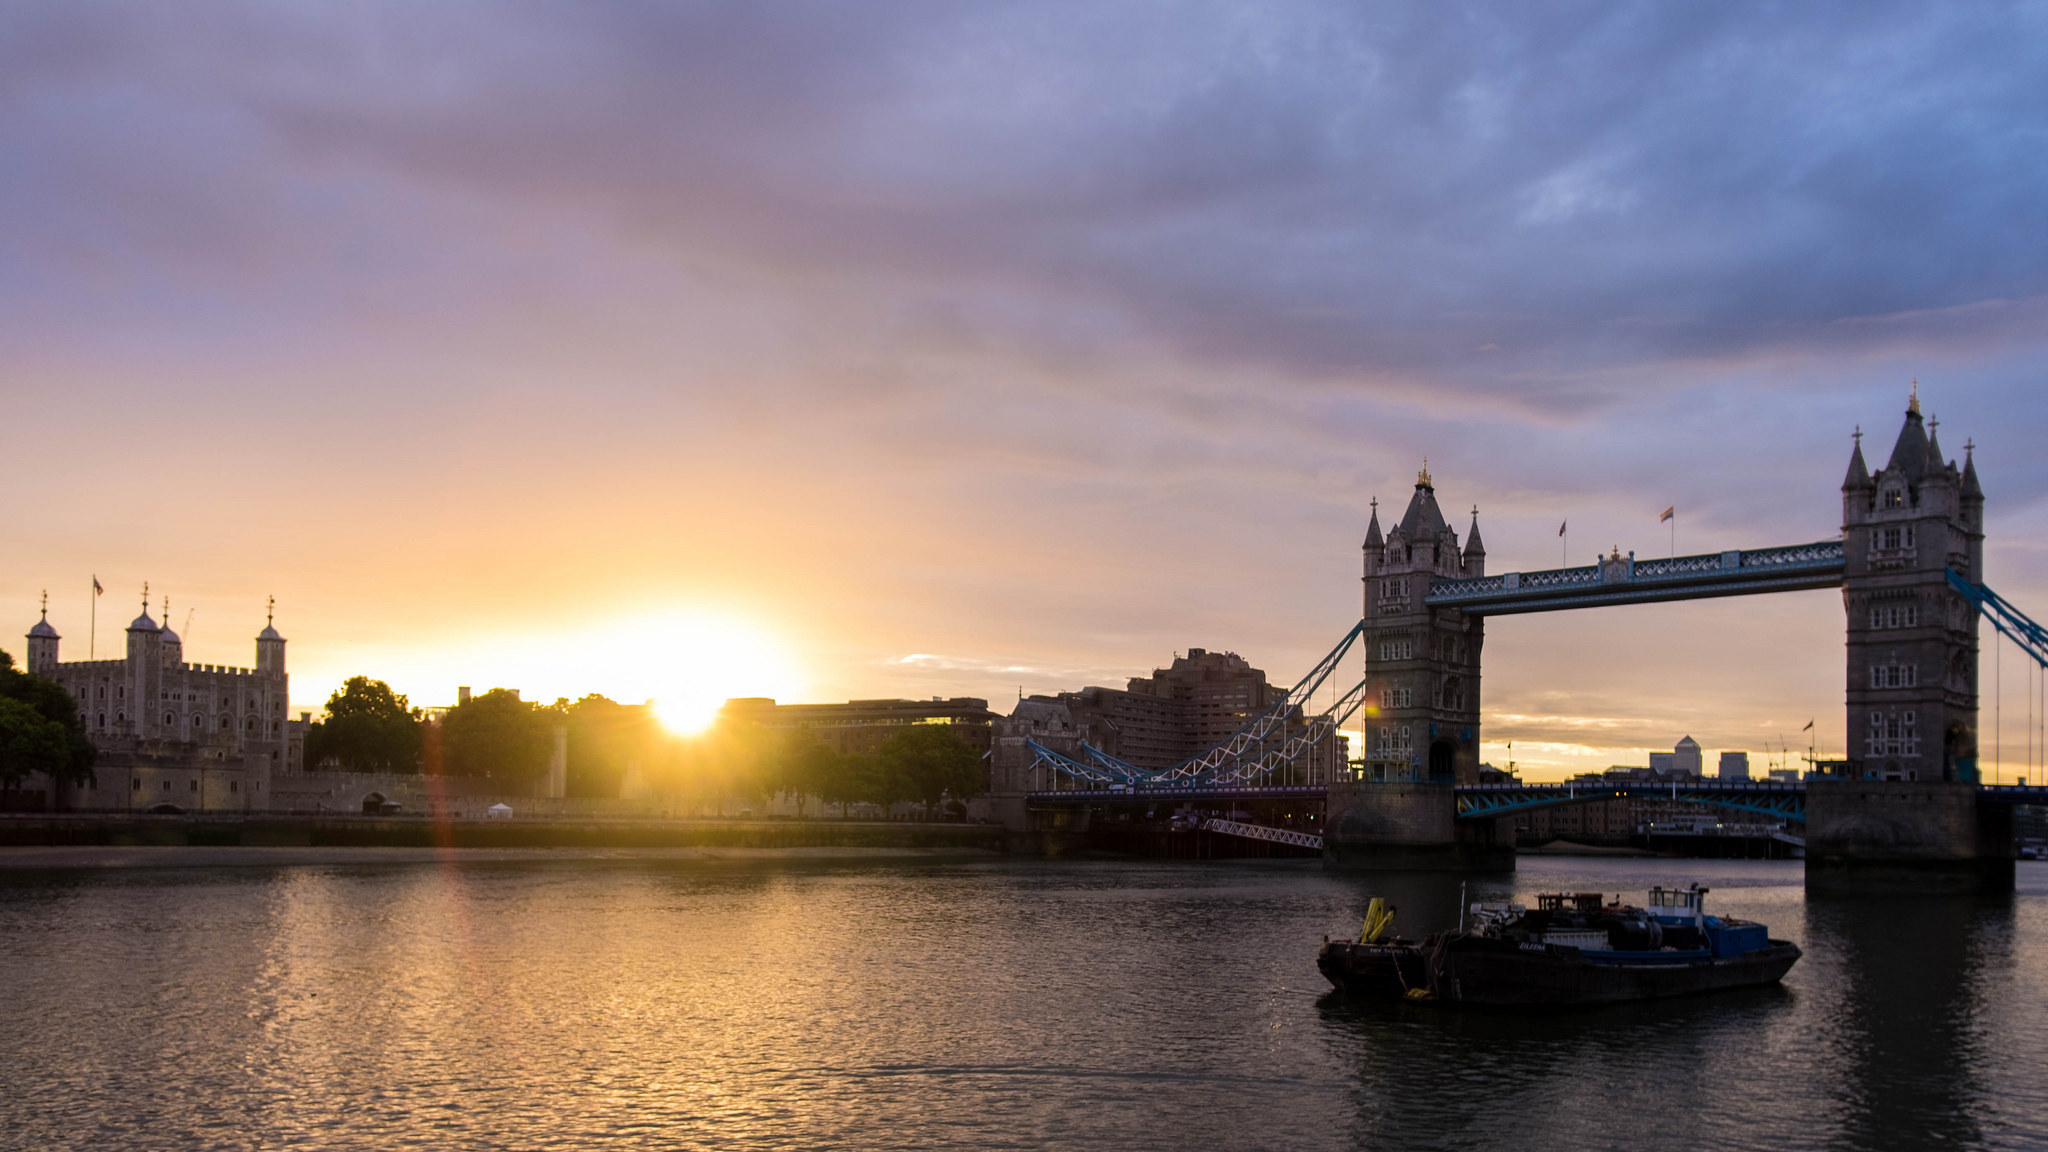 8 atmospheric photos of London sunrises